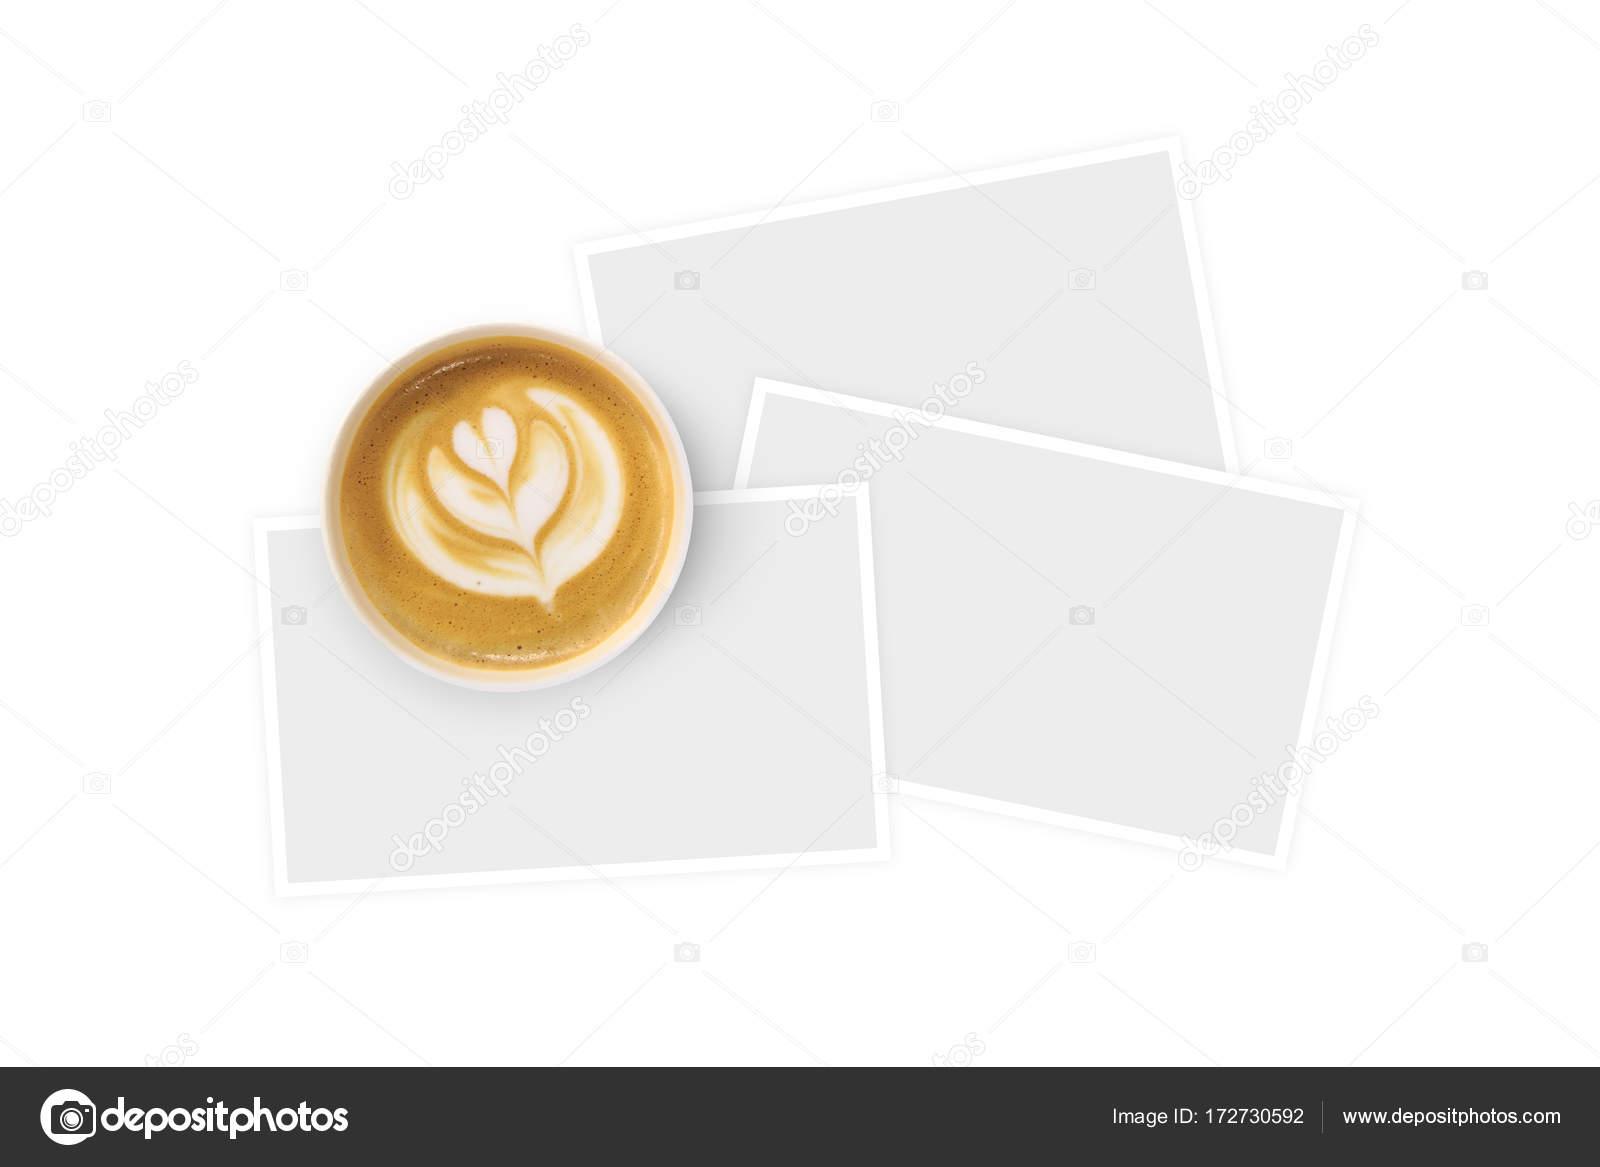 Geformte Tasse Kaffee mit Papprahmen — Stockfoto © niglaynike #172730592